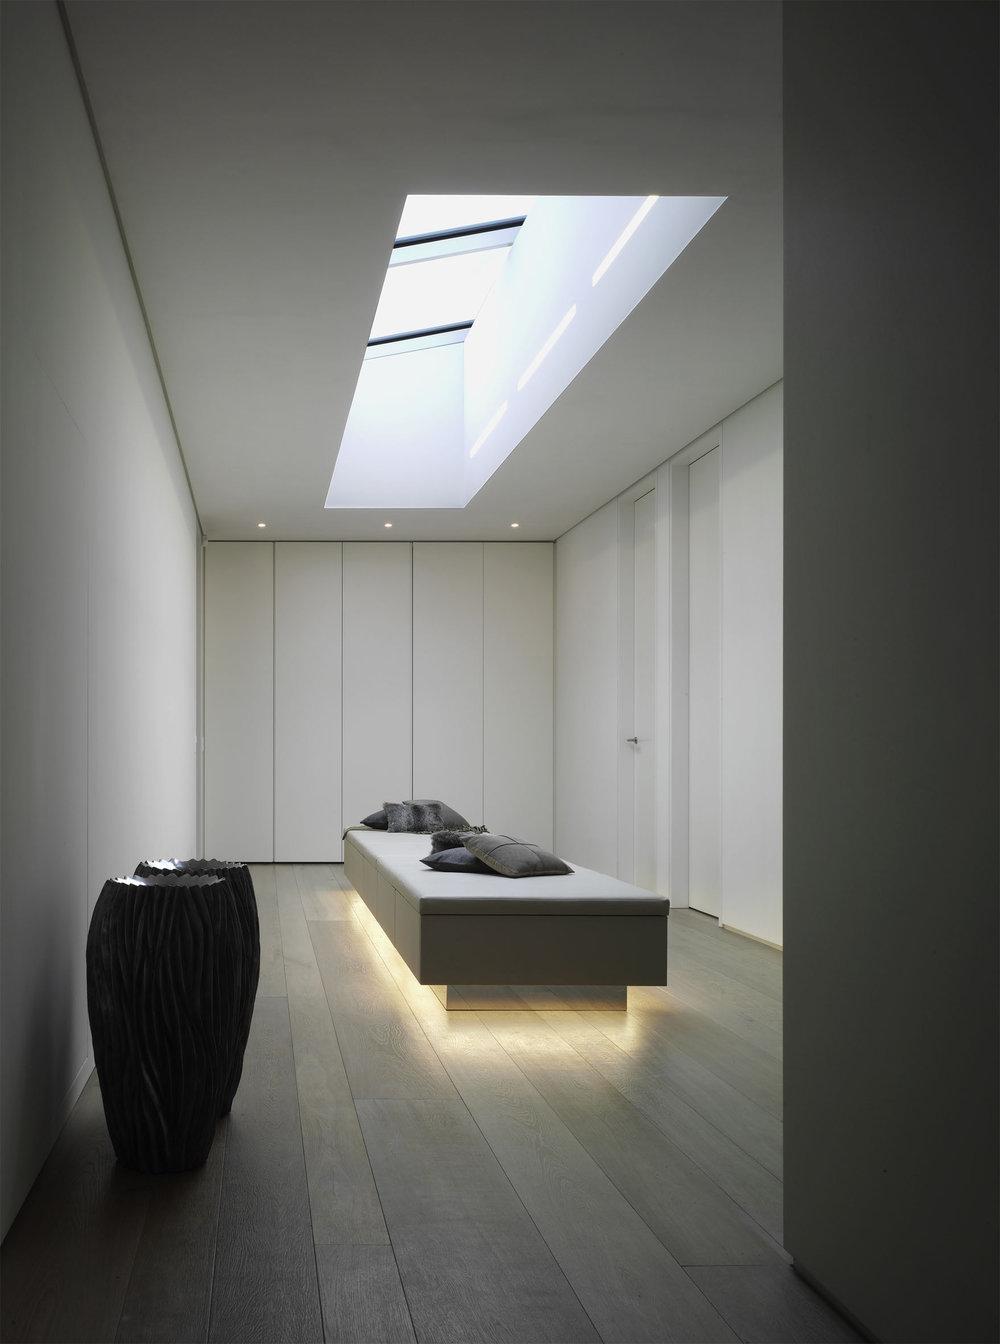 048_iria_degen_interiors_house_evilard3.jpg